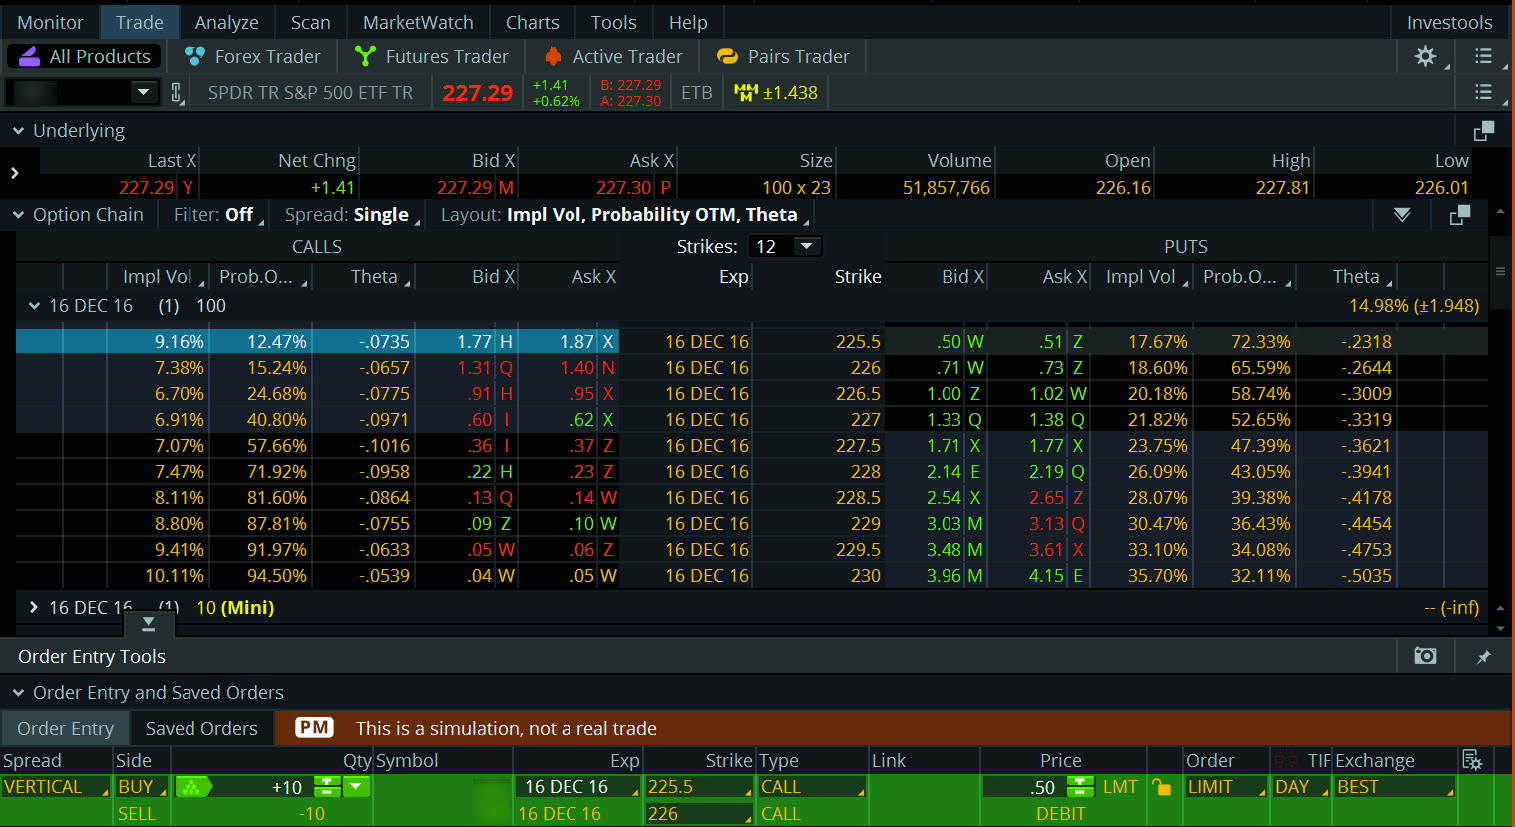 paperMoney trading platform